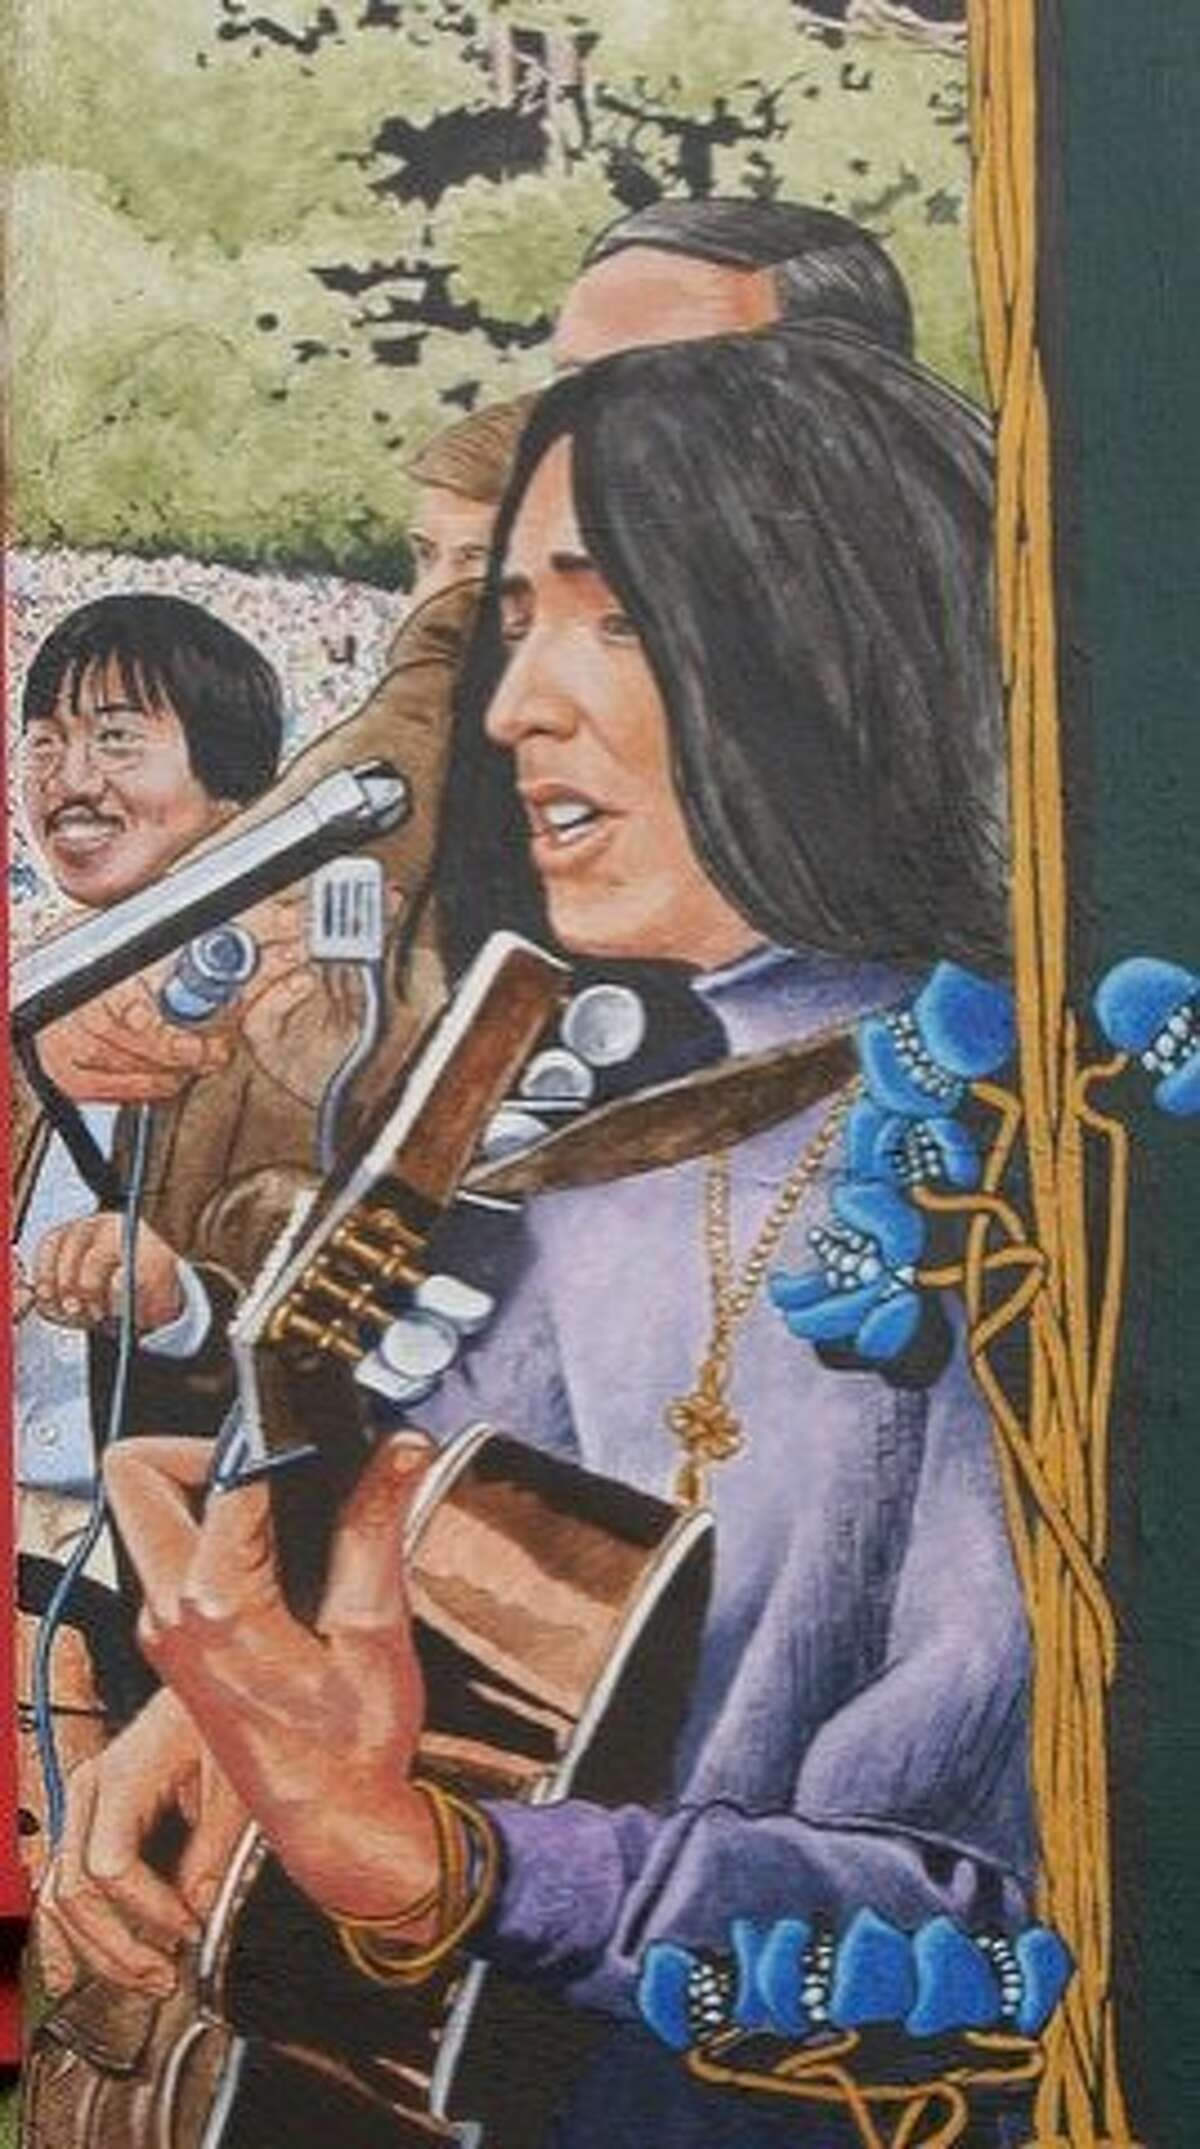 Part of a Haight Street mural by Bill Weber shows Joan Baez and, left, Ben Fong-Torres.